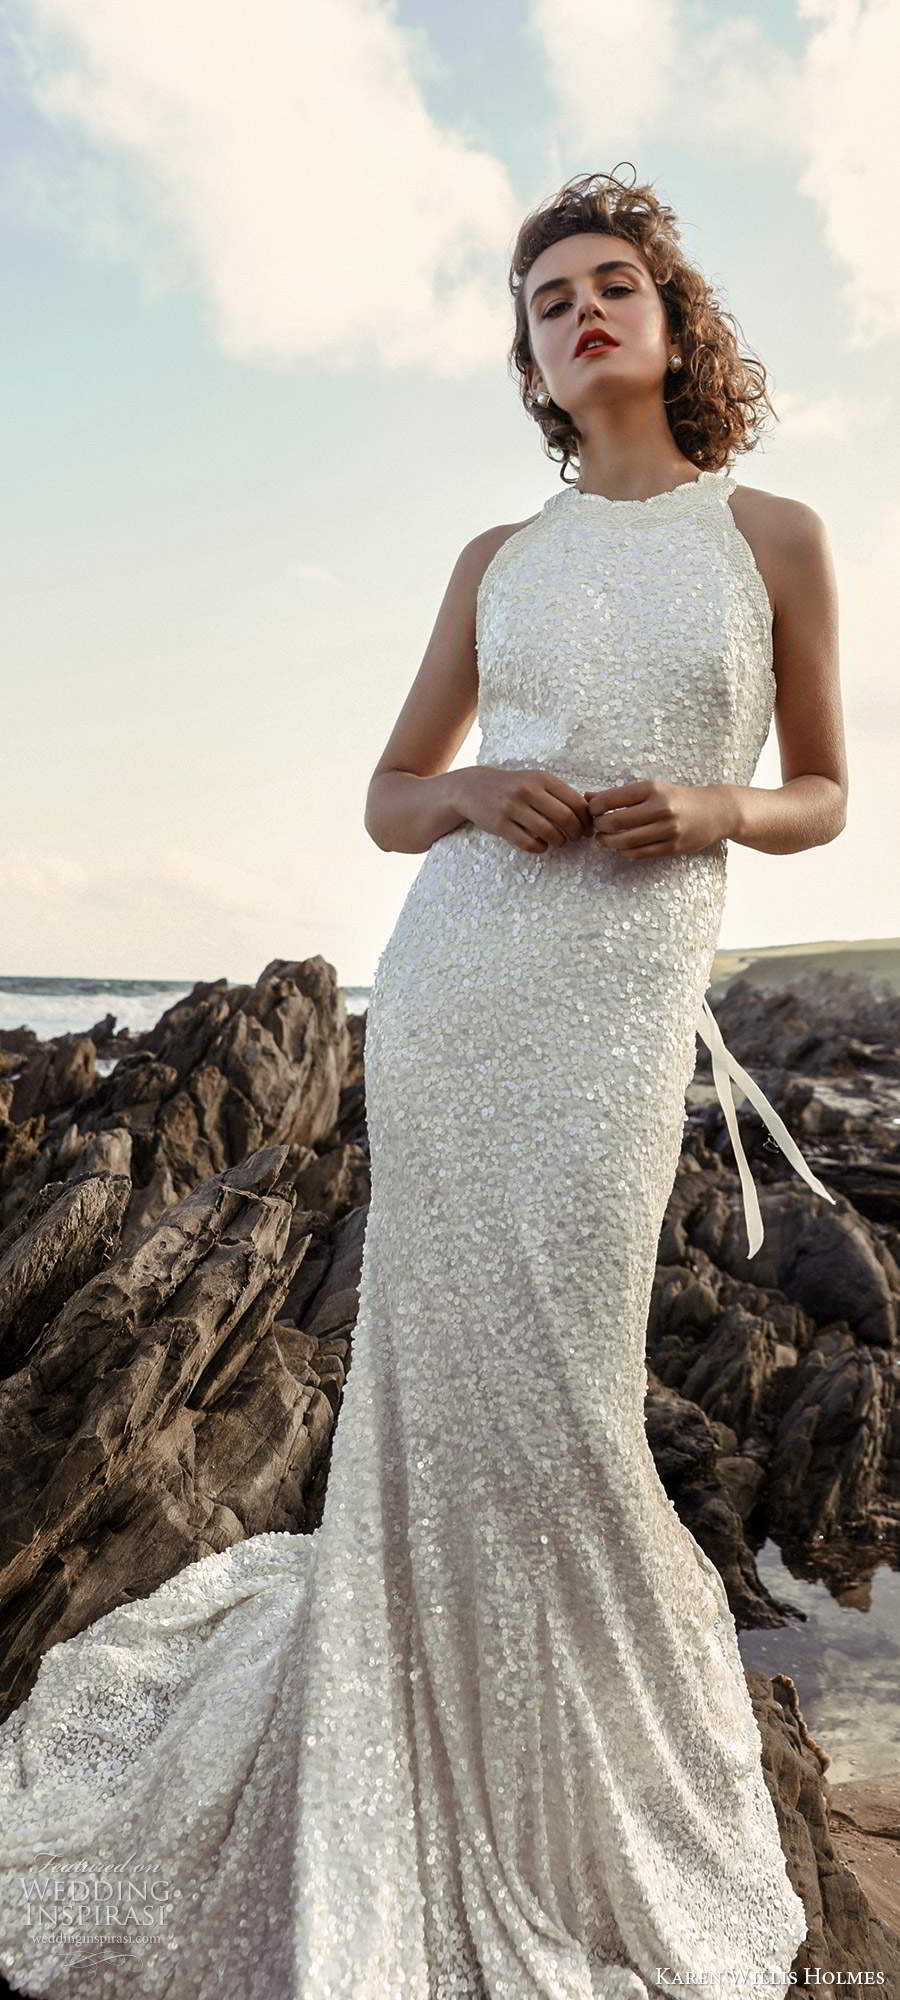 karen willis holmes 2020 bridal sleeveless halter neckline fully embellished sheath wedding dress chapel train (4) mv